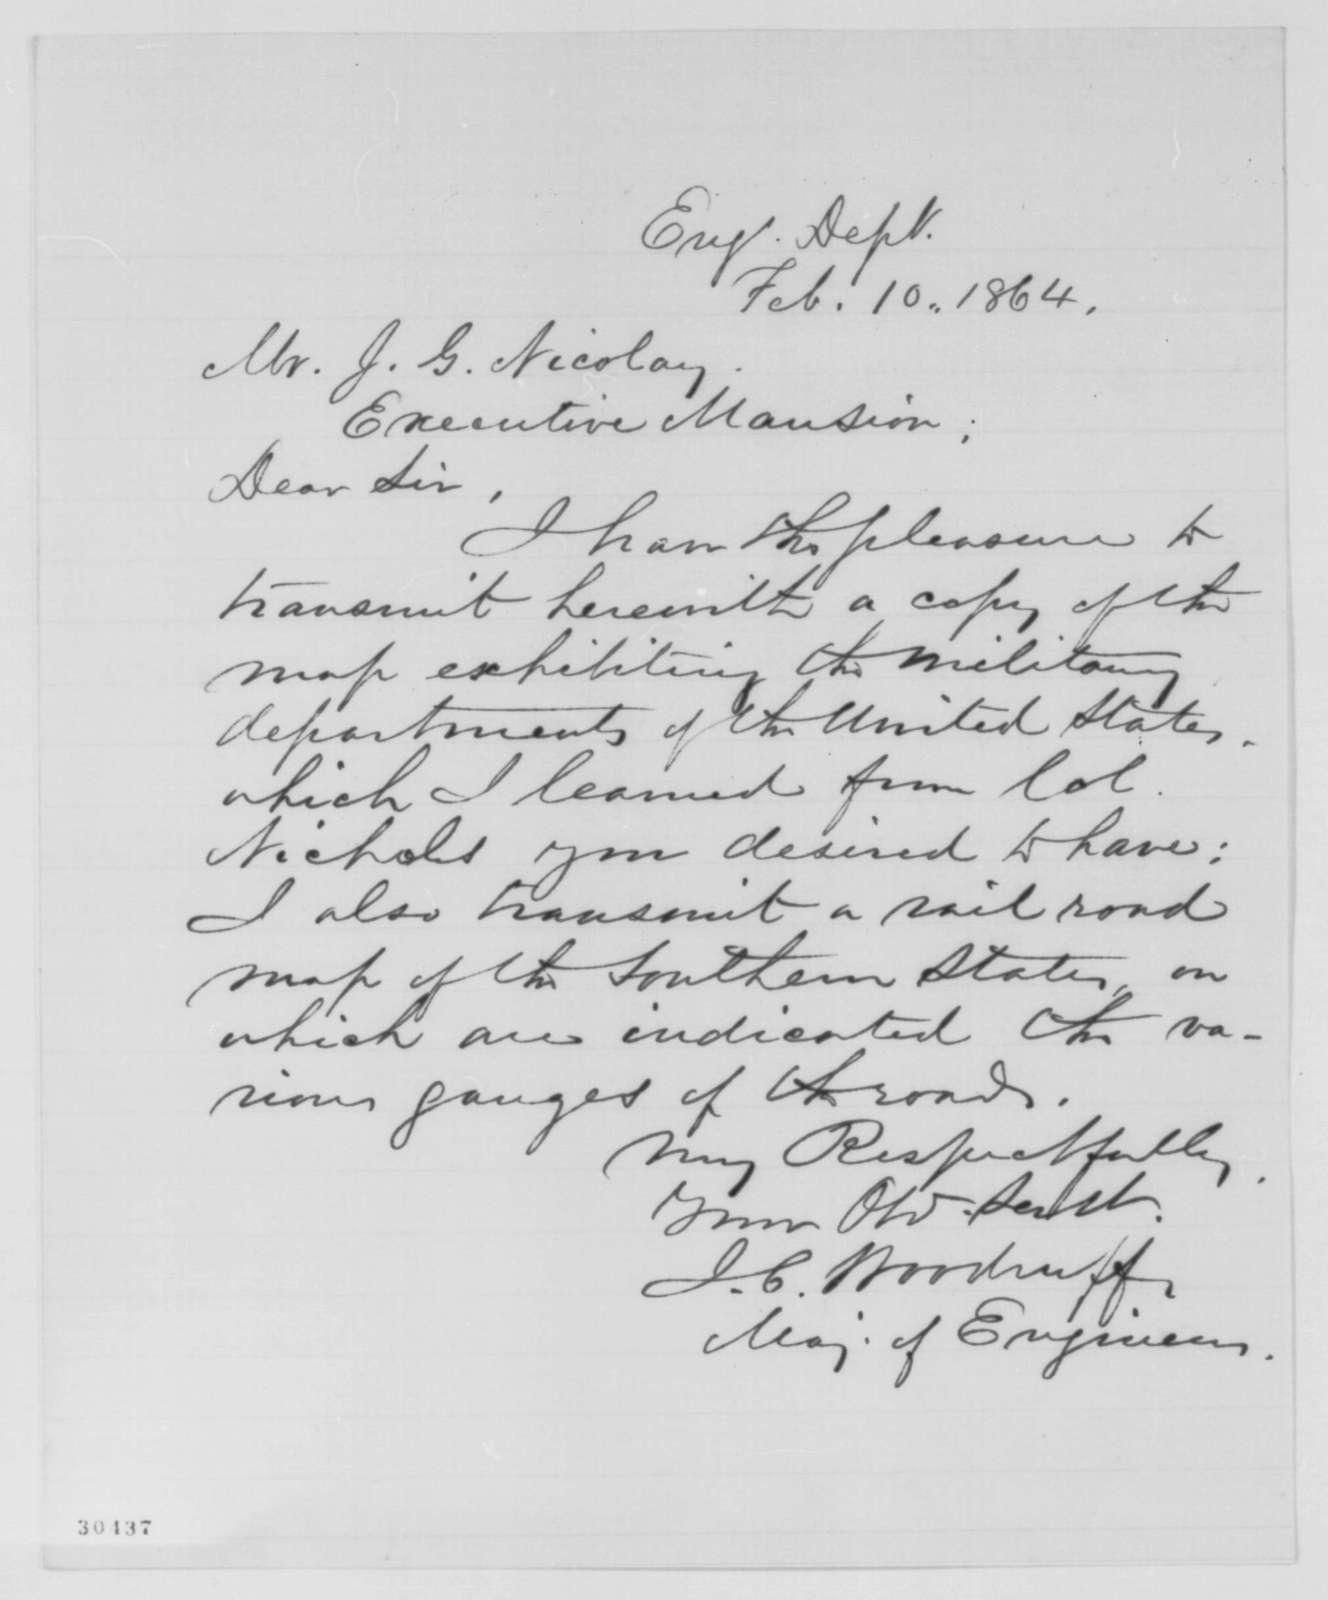 Israel C. Woodruff to John G. Nicolay, Wednesday, February 10, 1864  (Sends maps)